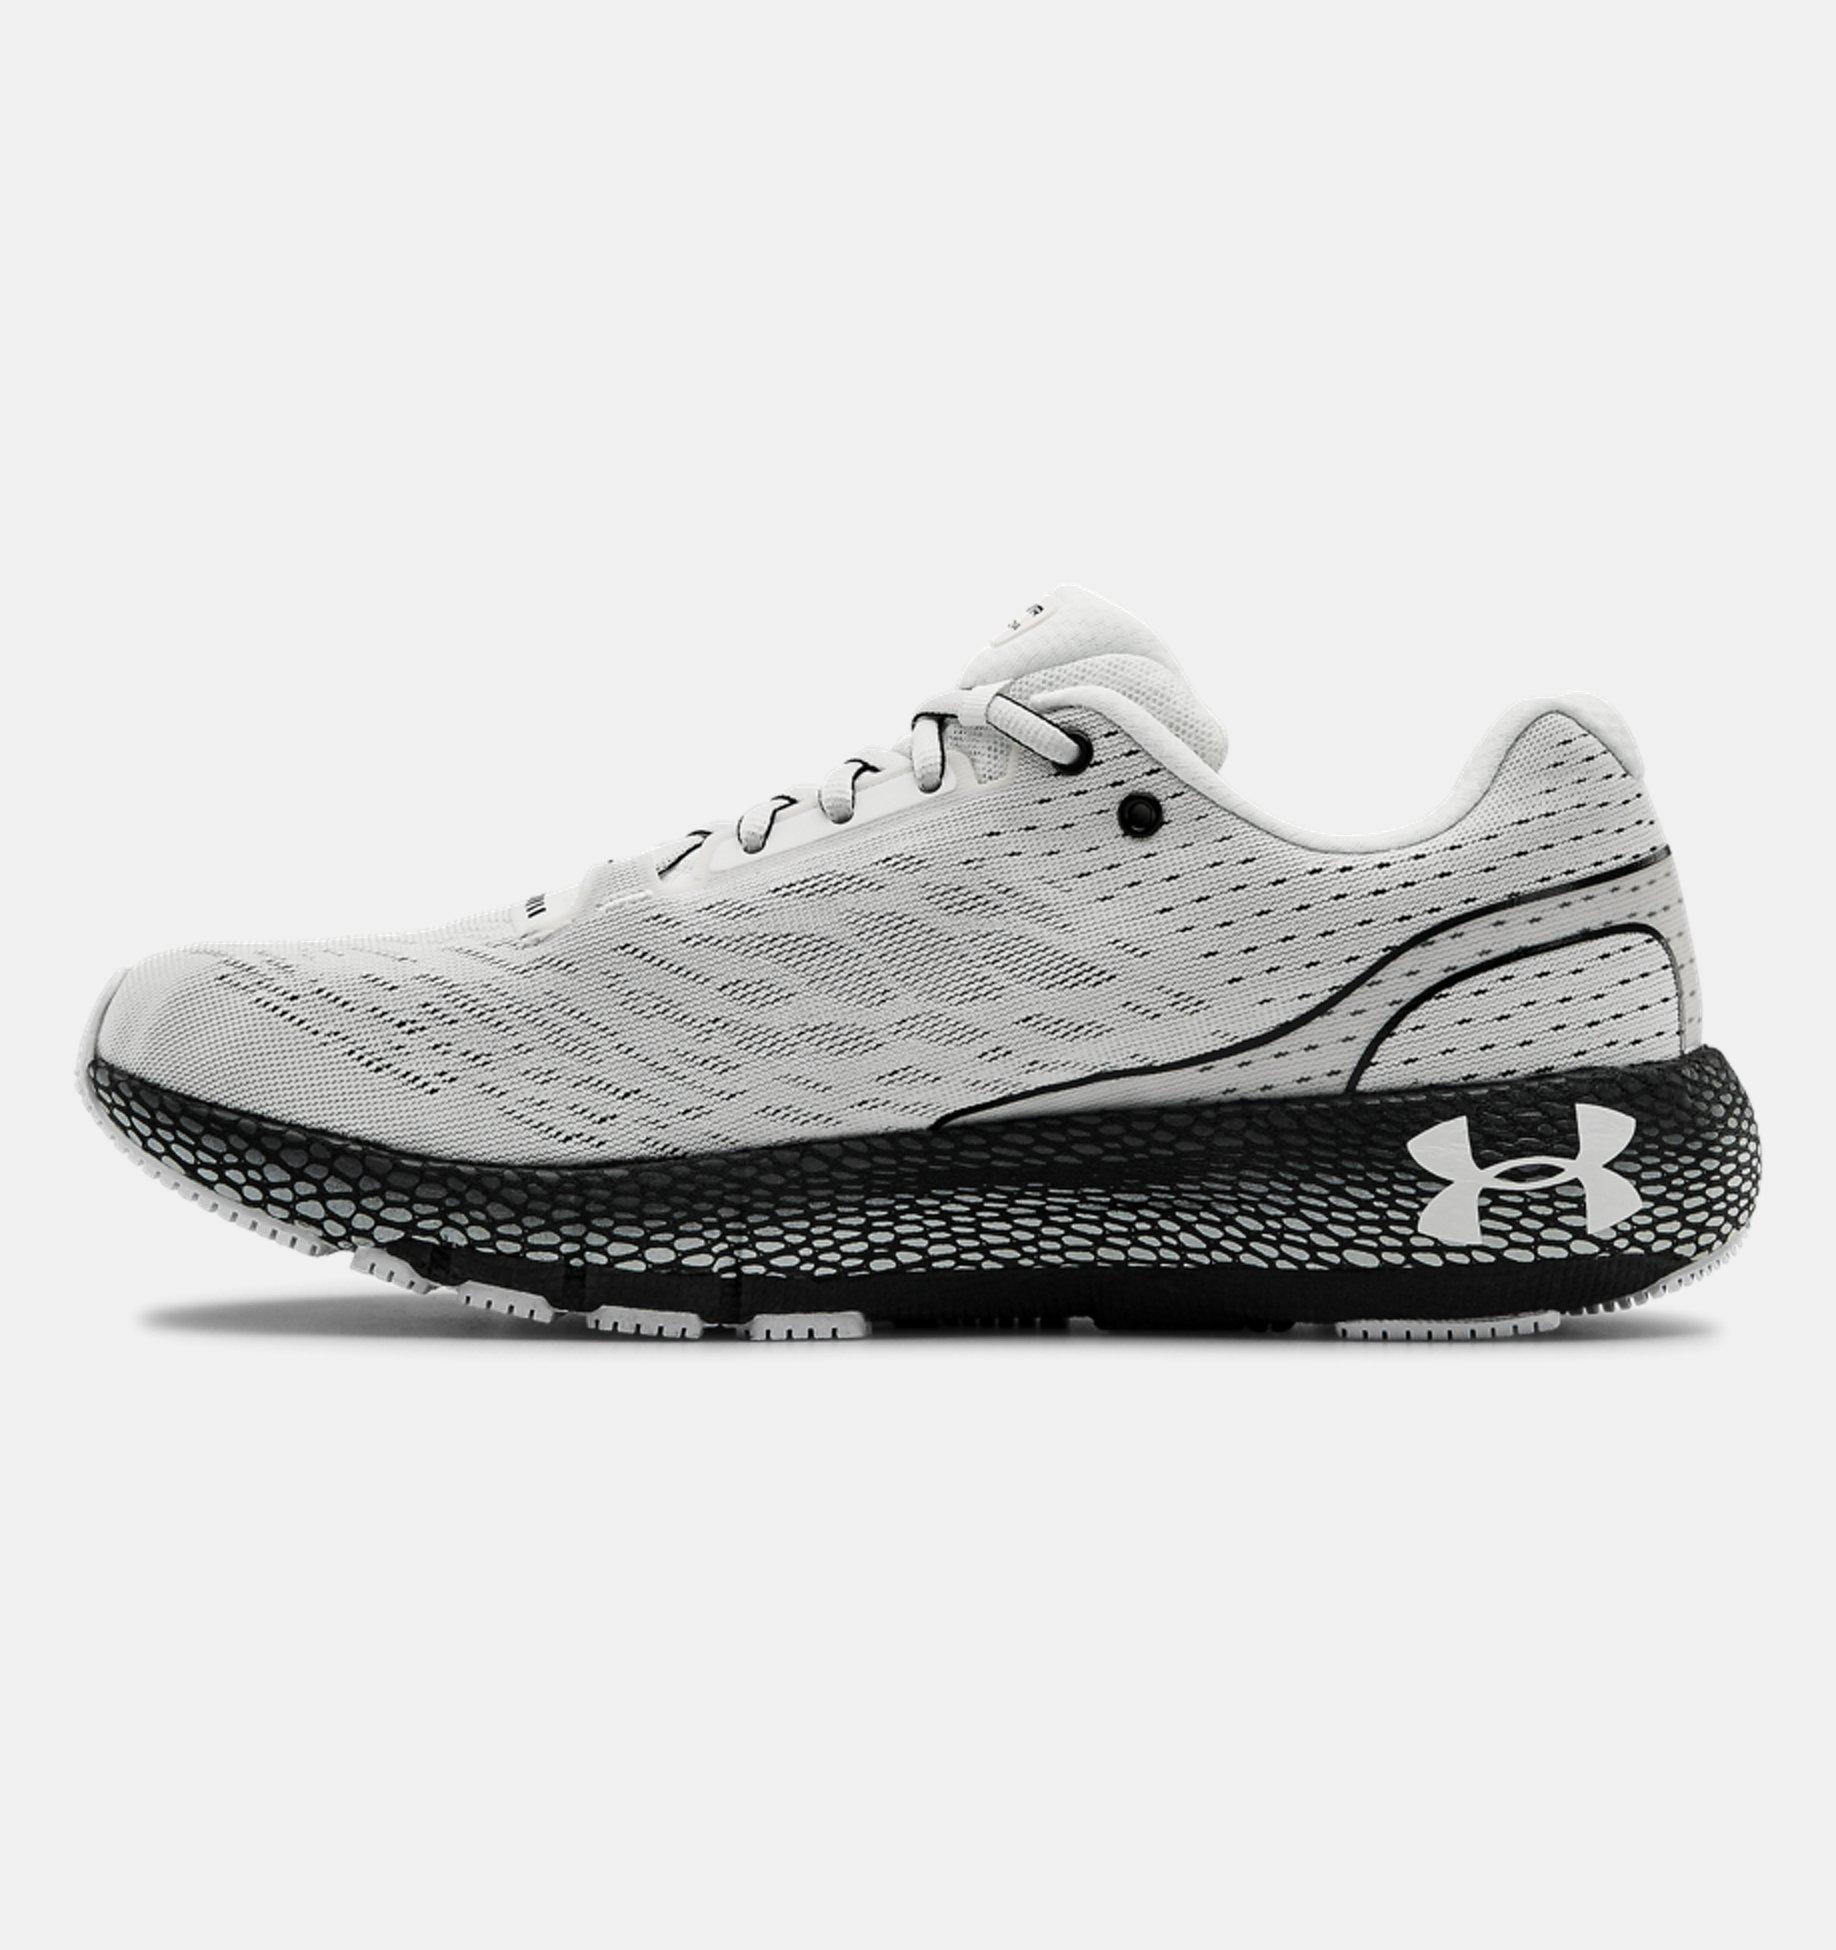 Men S Ua Hovr Machina Running Shoes Under Armour